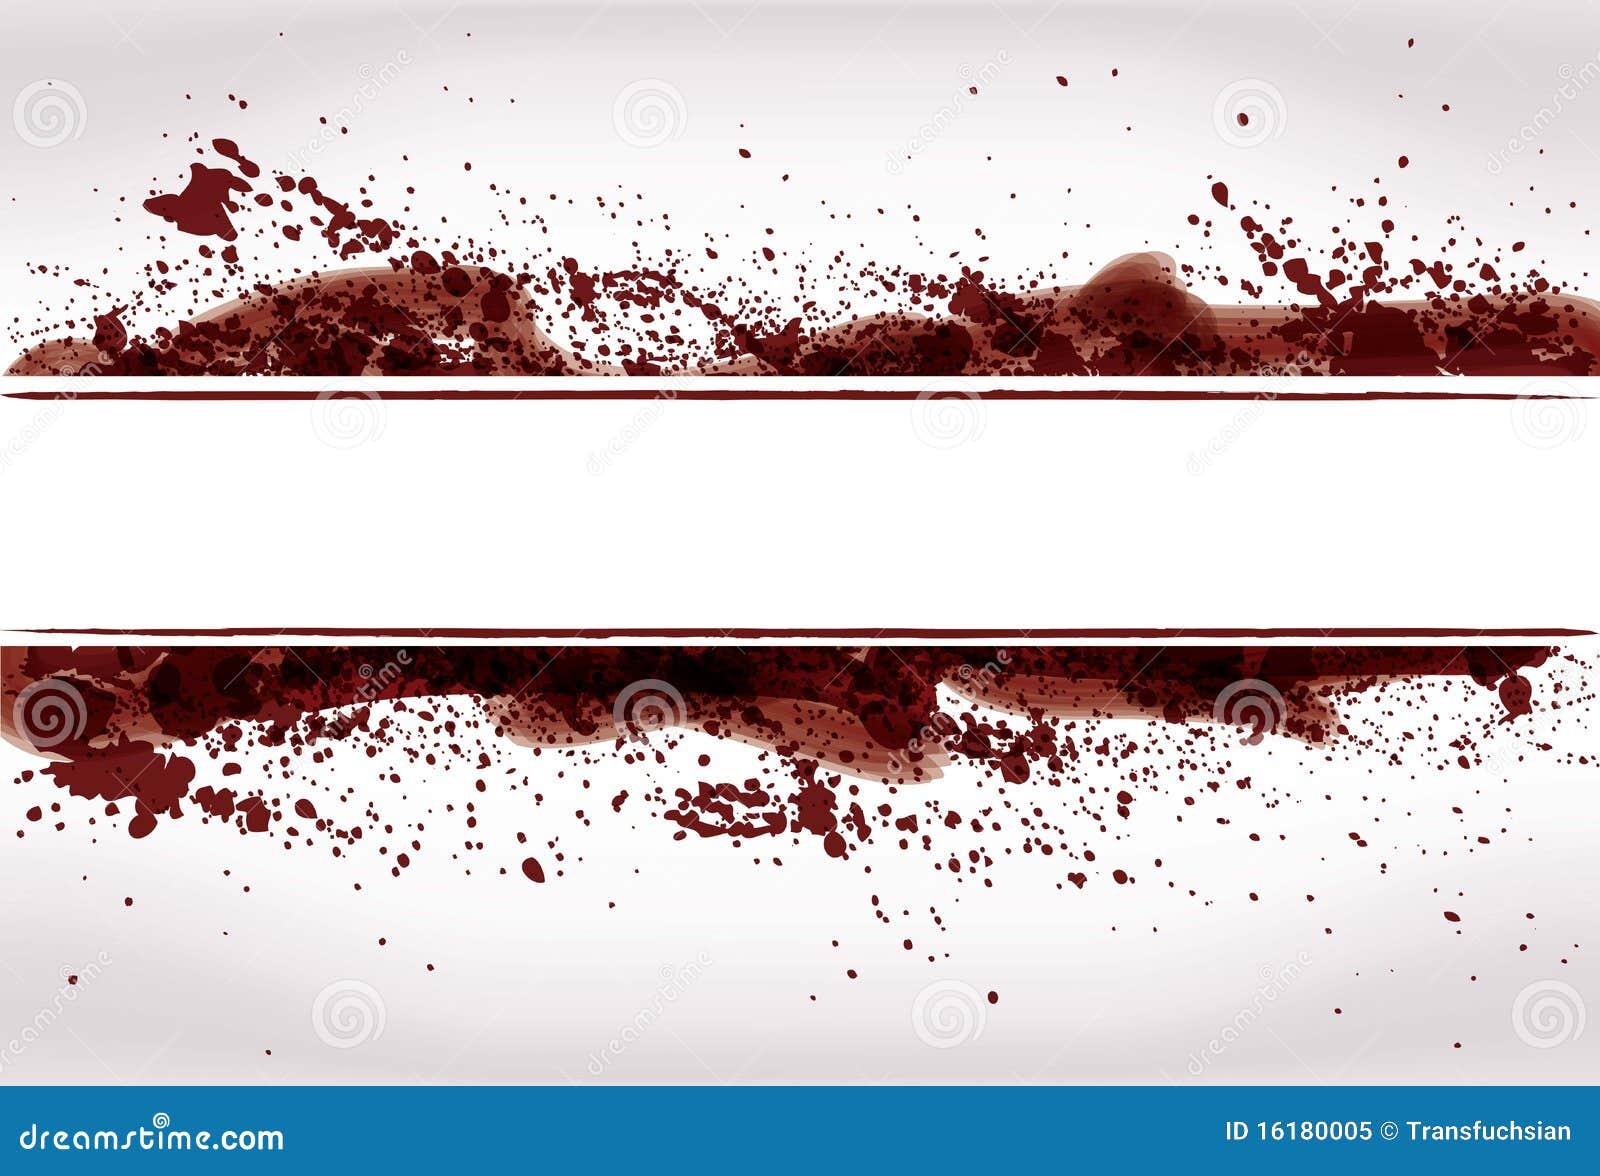 Black paint splatter wallpaper - Abstract Grunge Blood Splatter Background Royalty Free